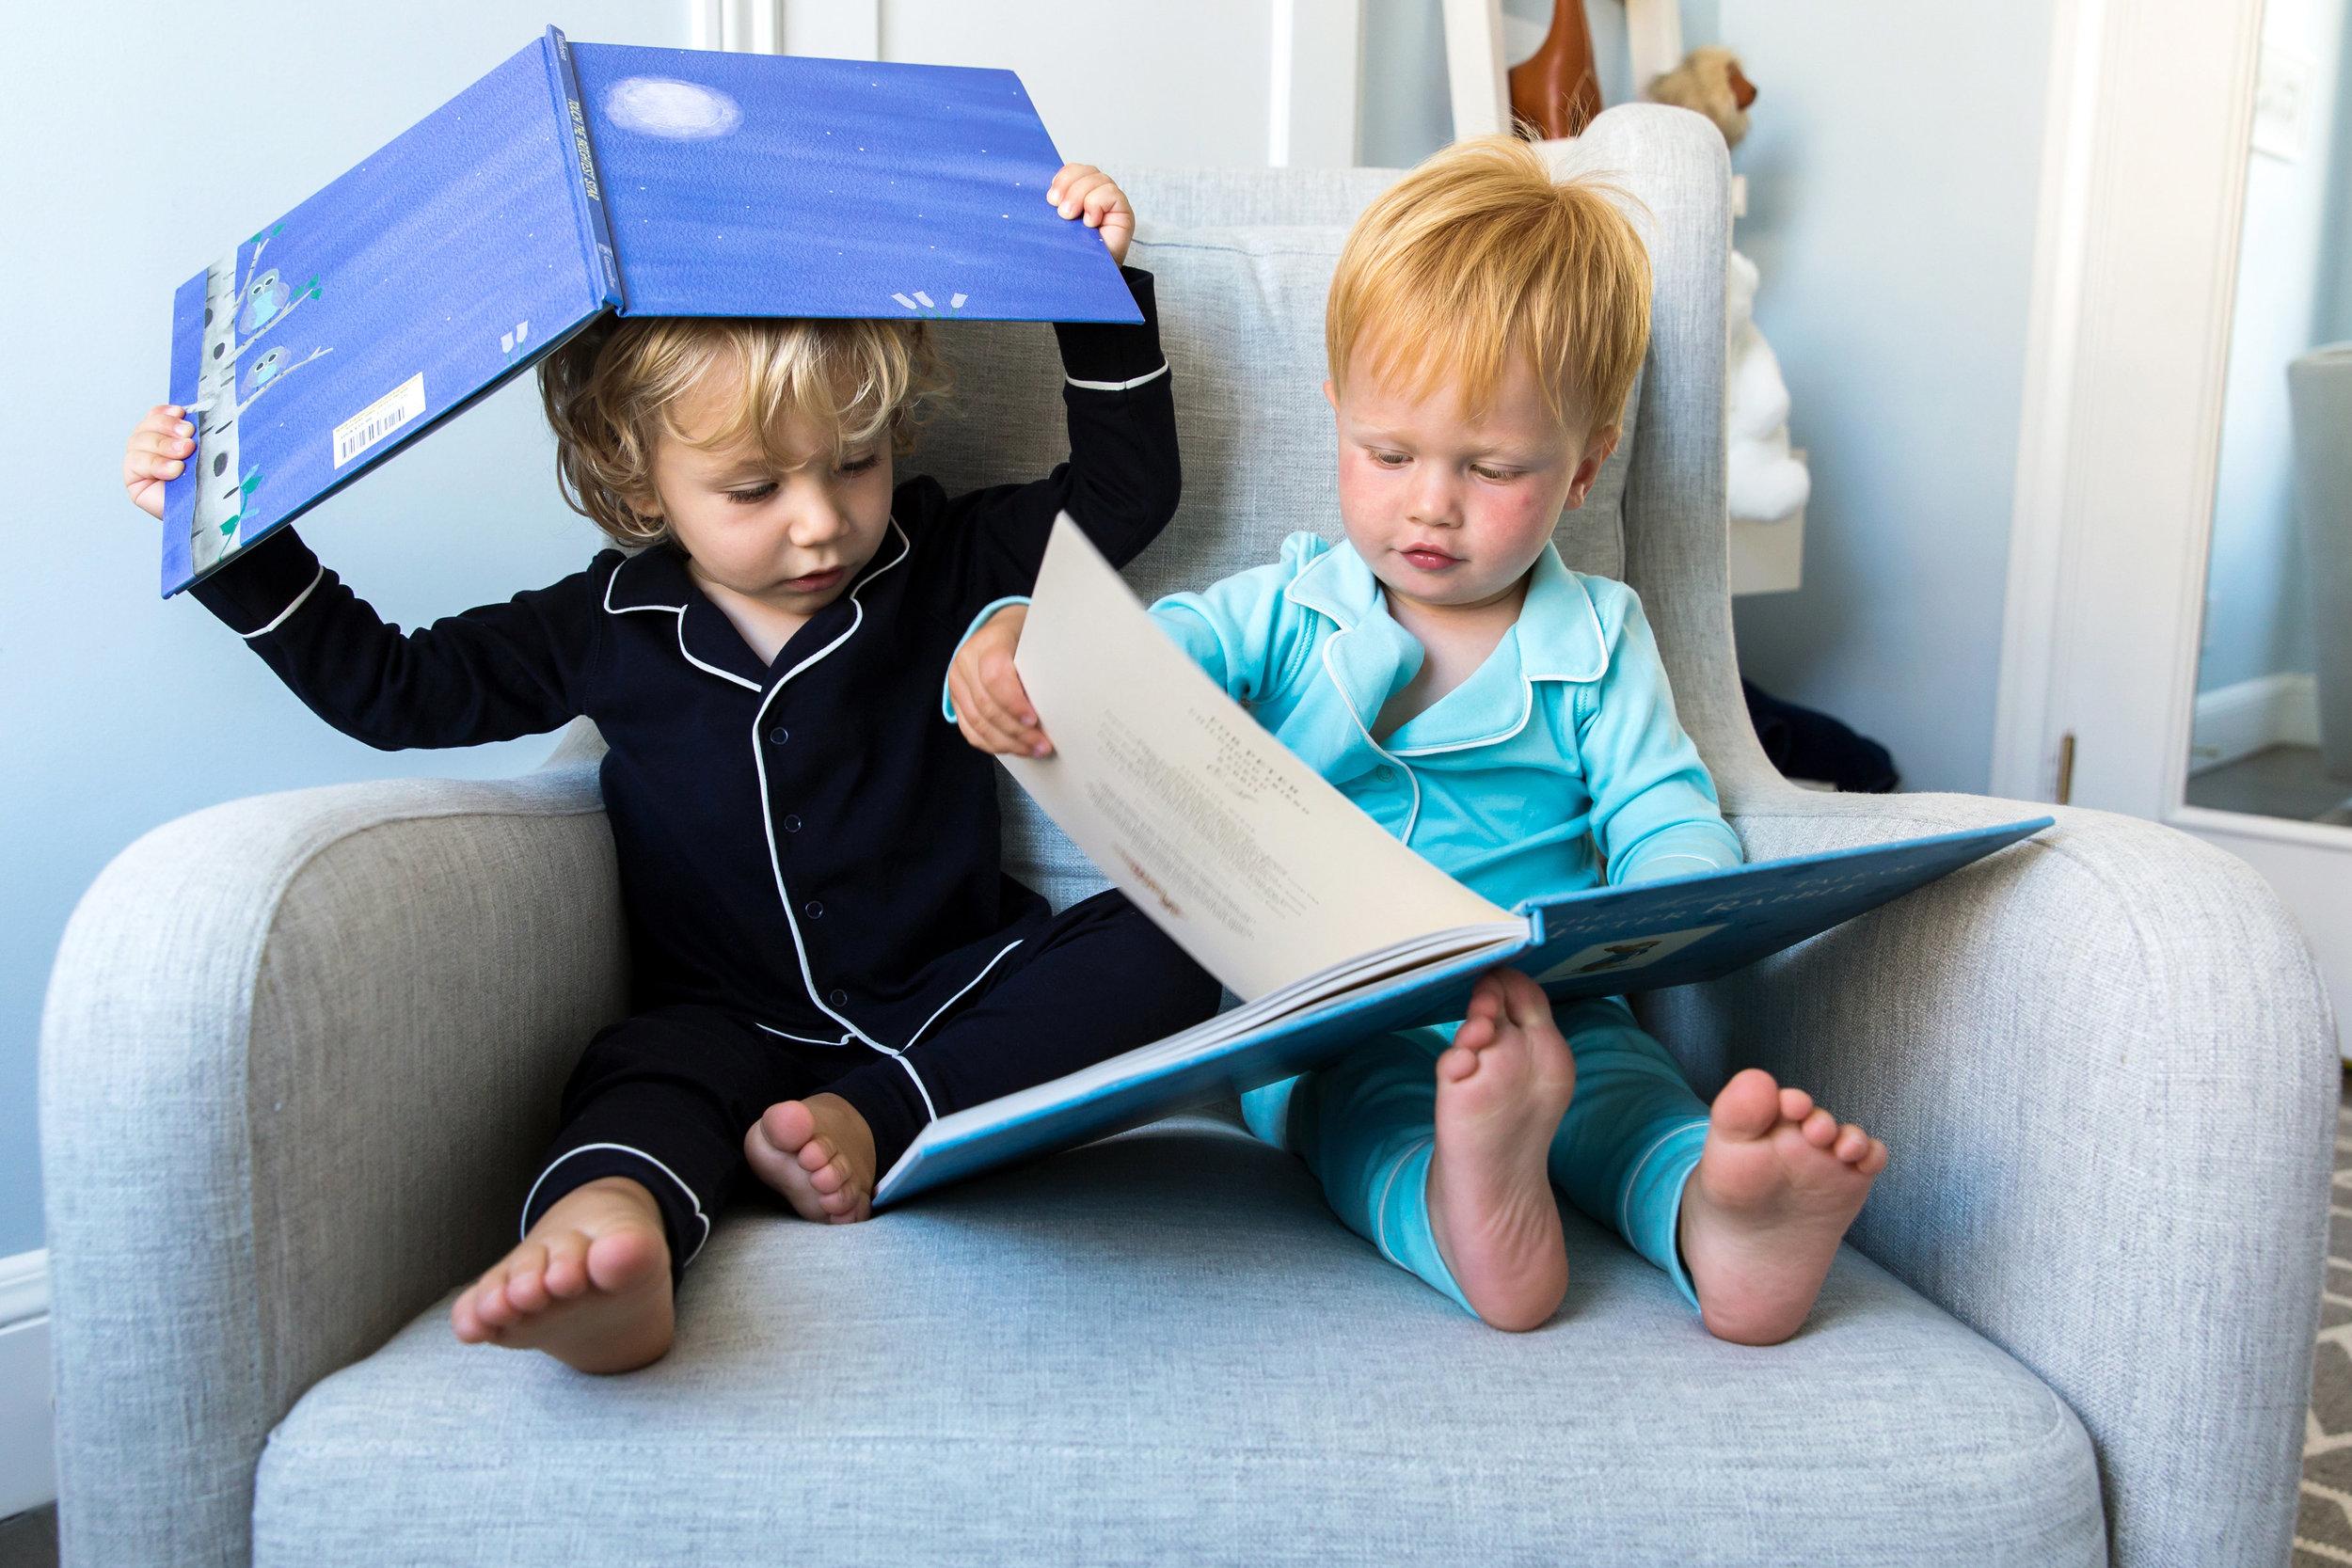 PaperCape-Storytime PJs copy.jpg